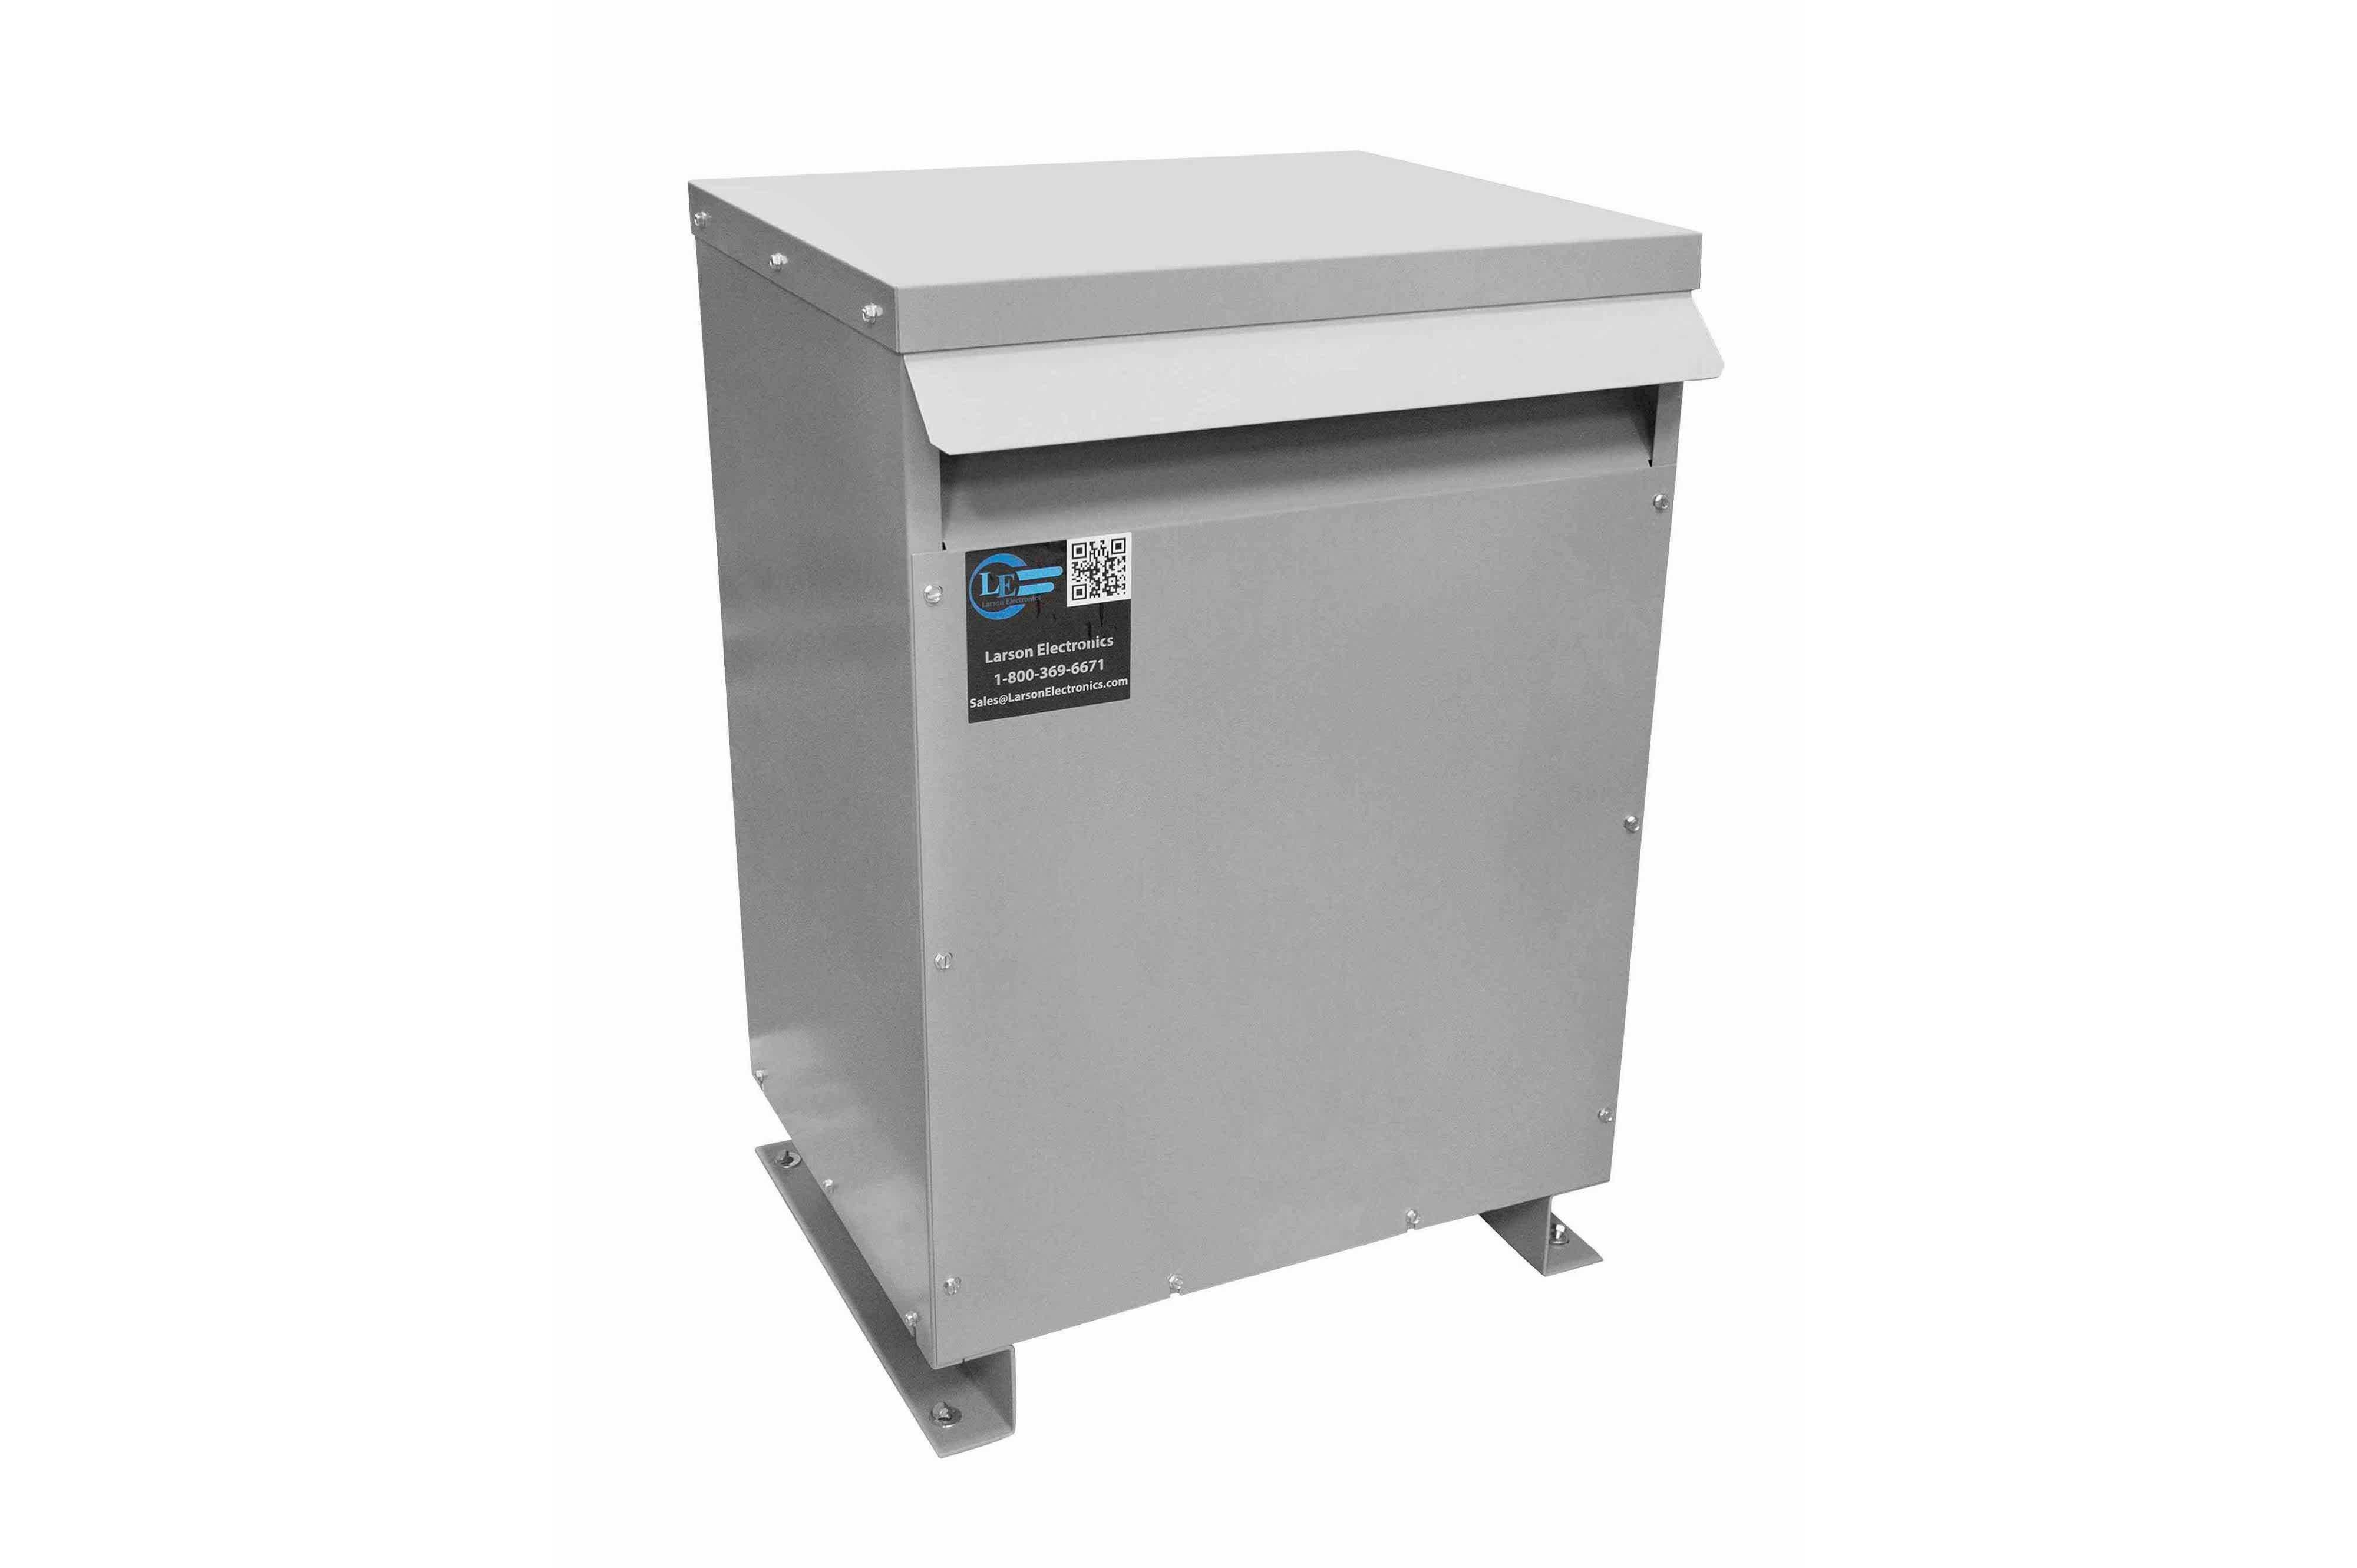 26 kVA 3PH Isolation Transformer, 208V Wye Primary, 380V Delta Secondary, N3R, Ventilated, 60 Hz